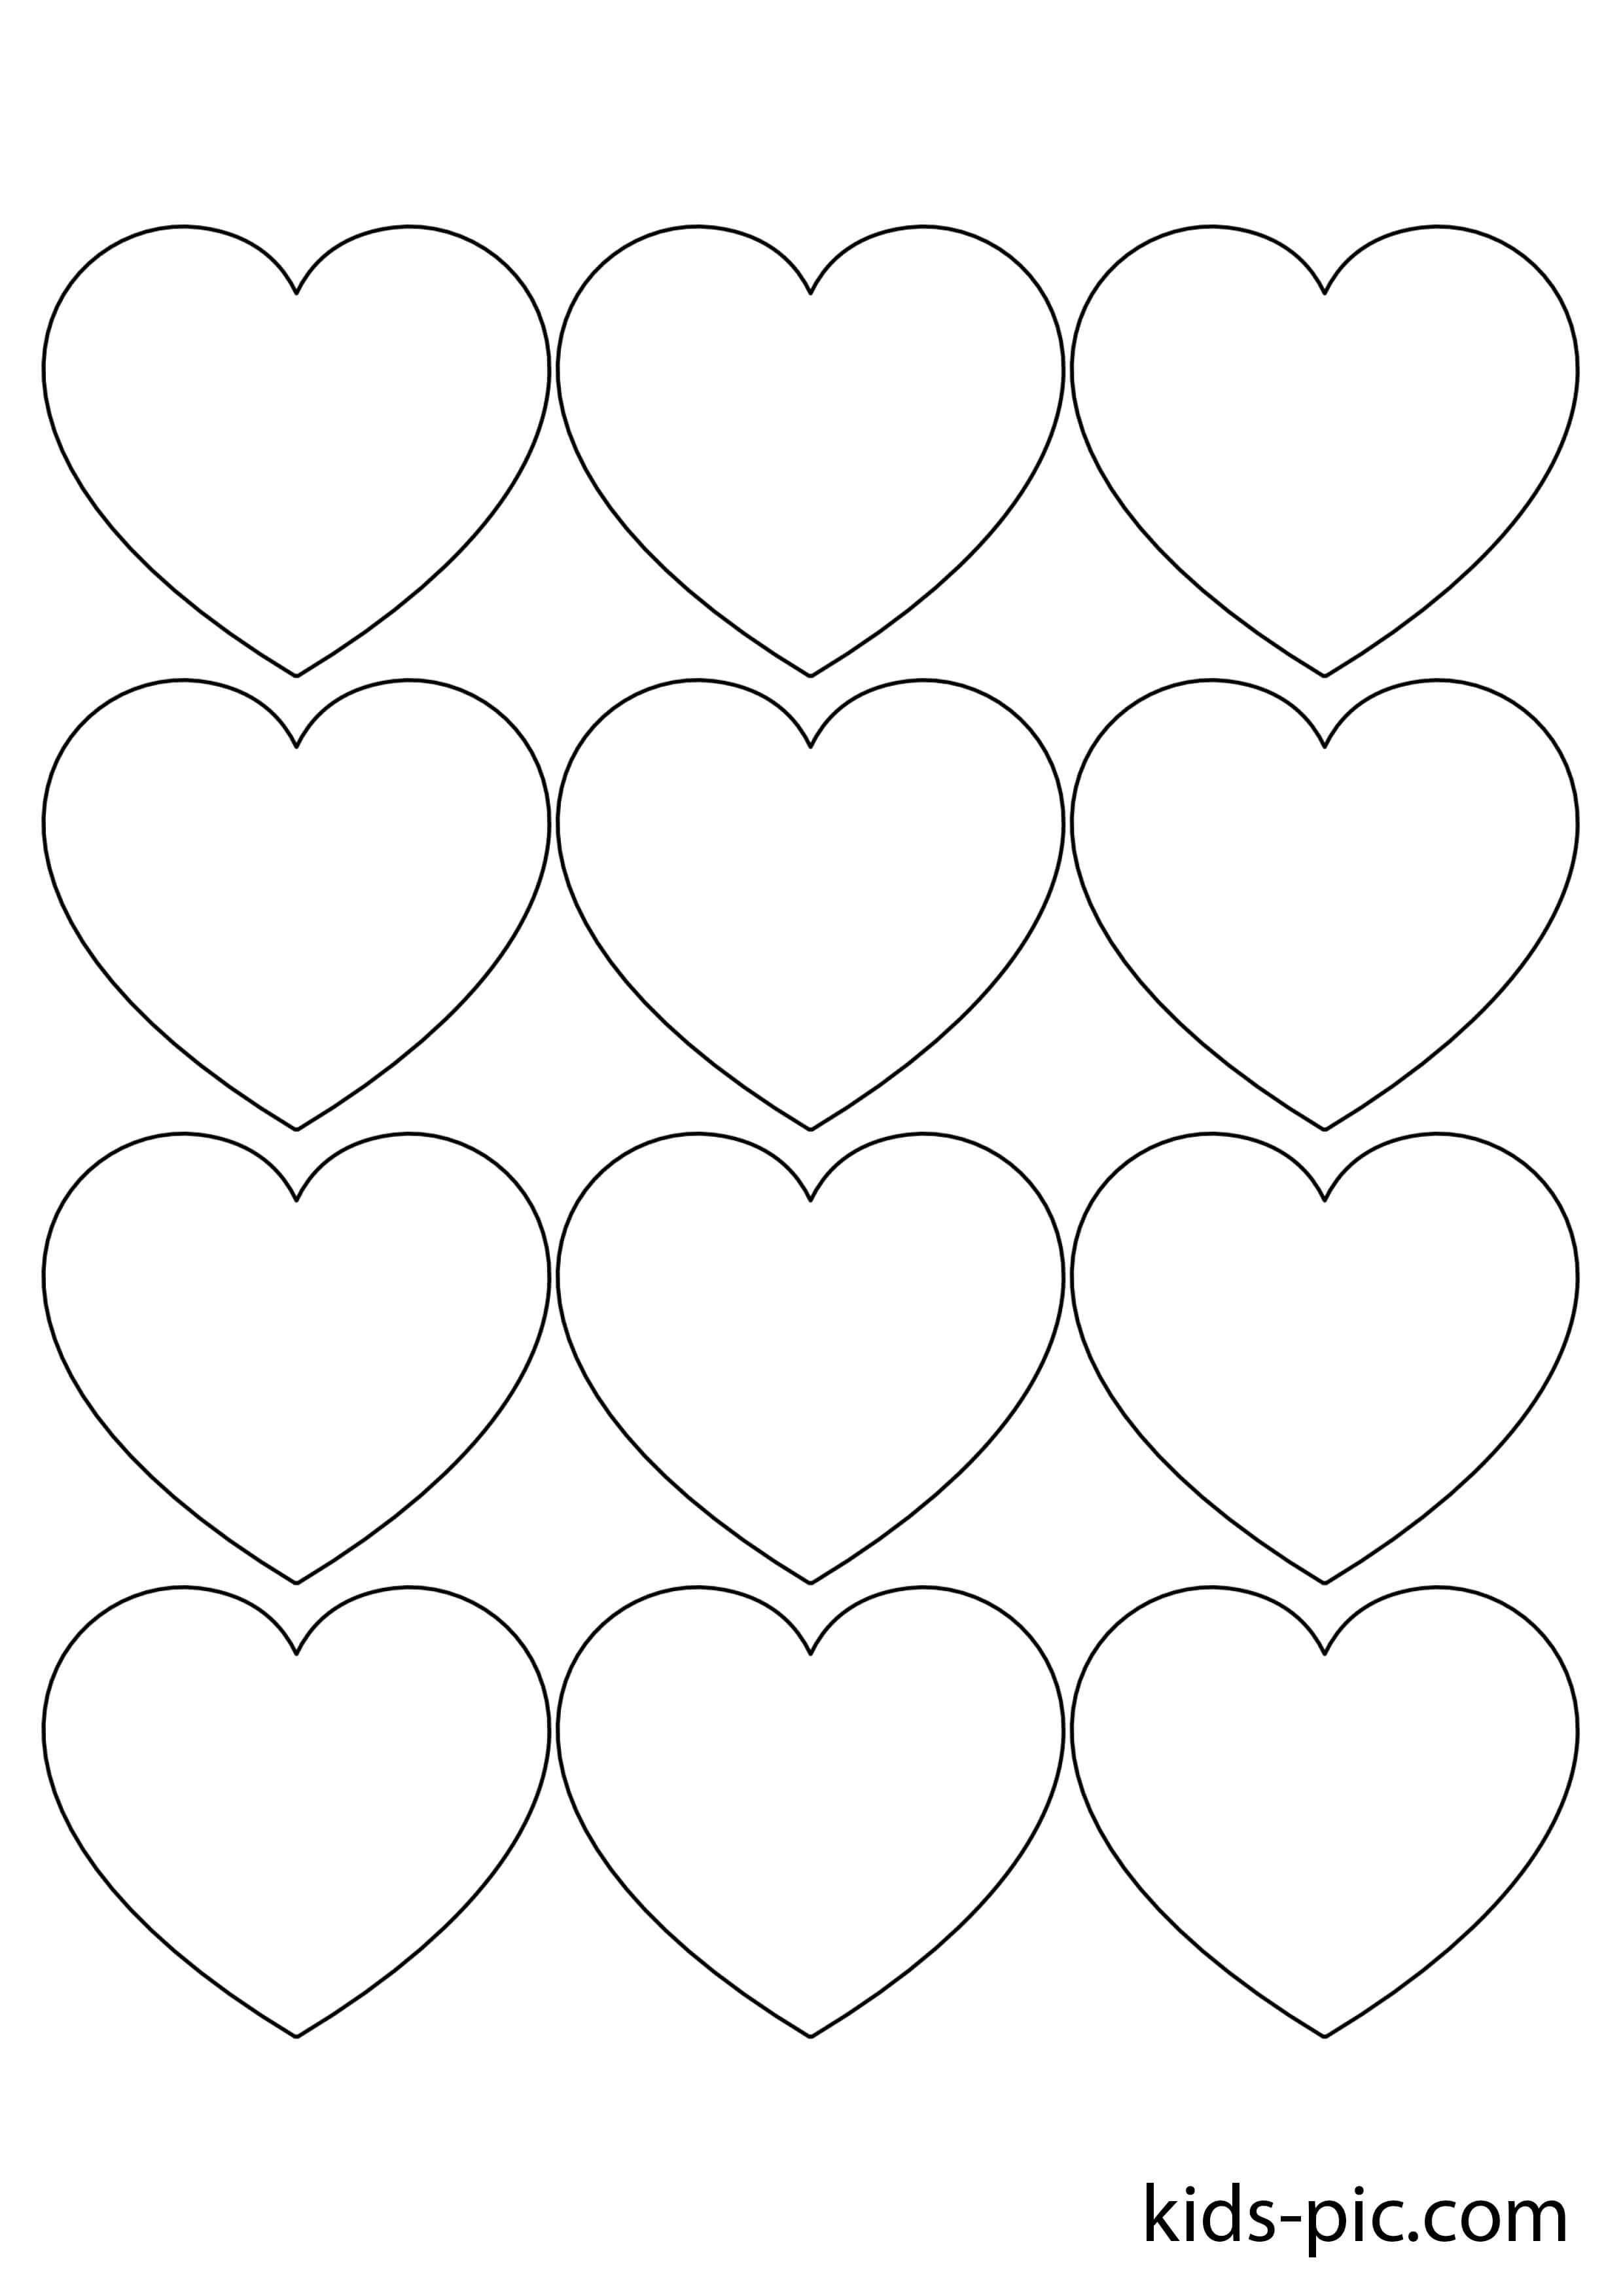 Деньгам, шаблон картинки с сердечками